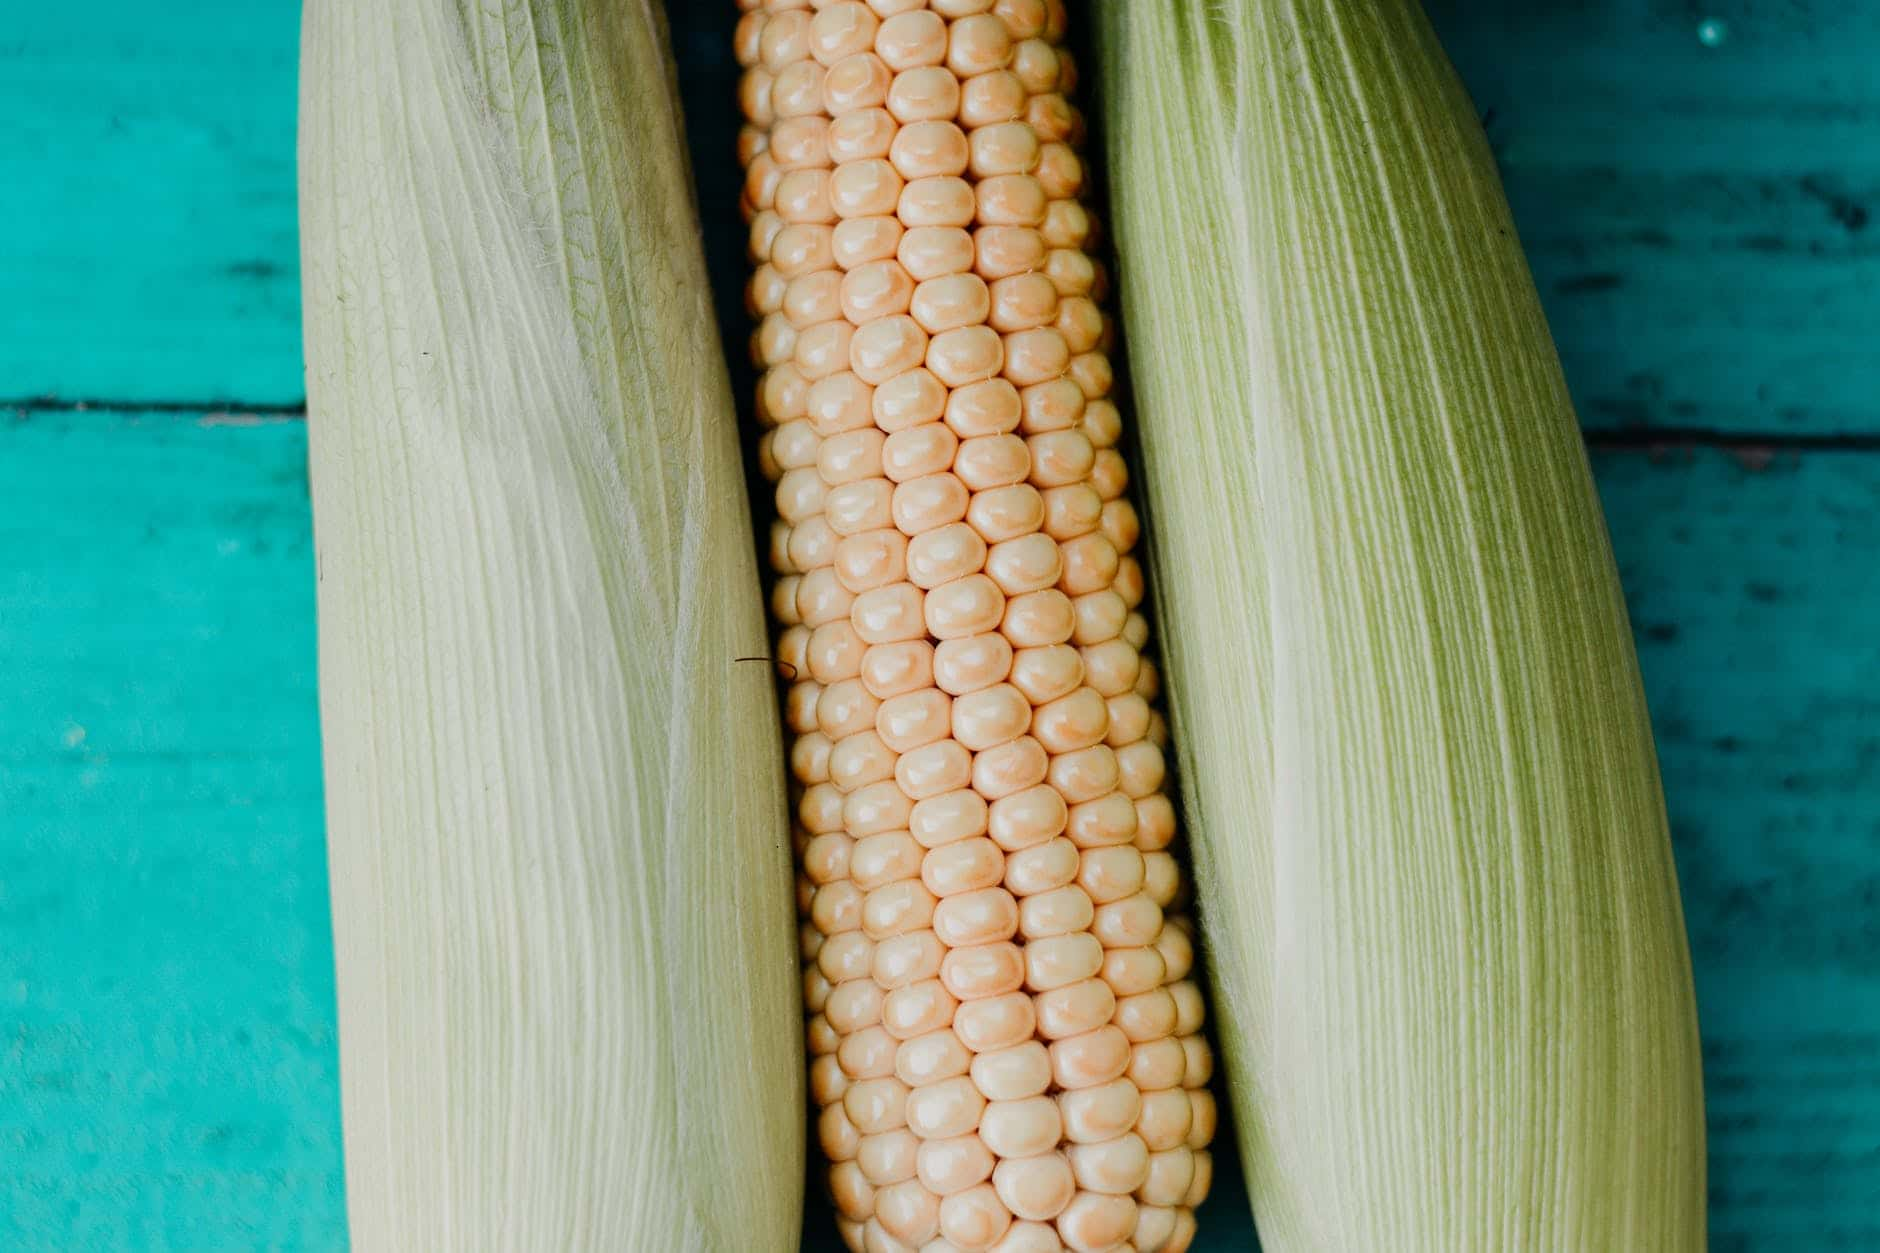 Storing fresh corn on the cob